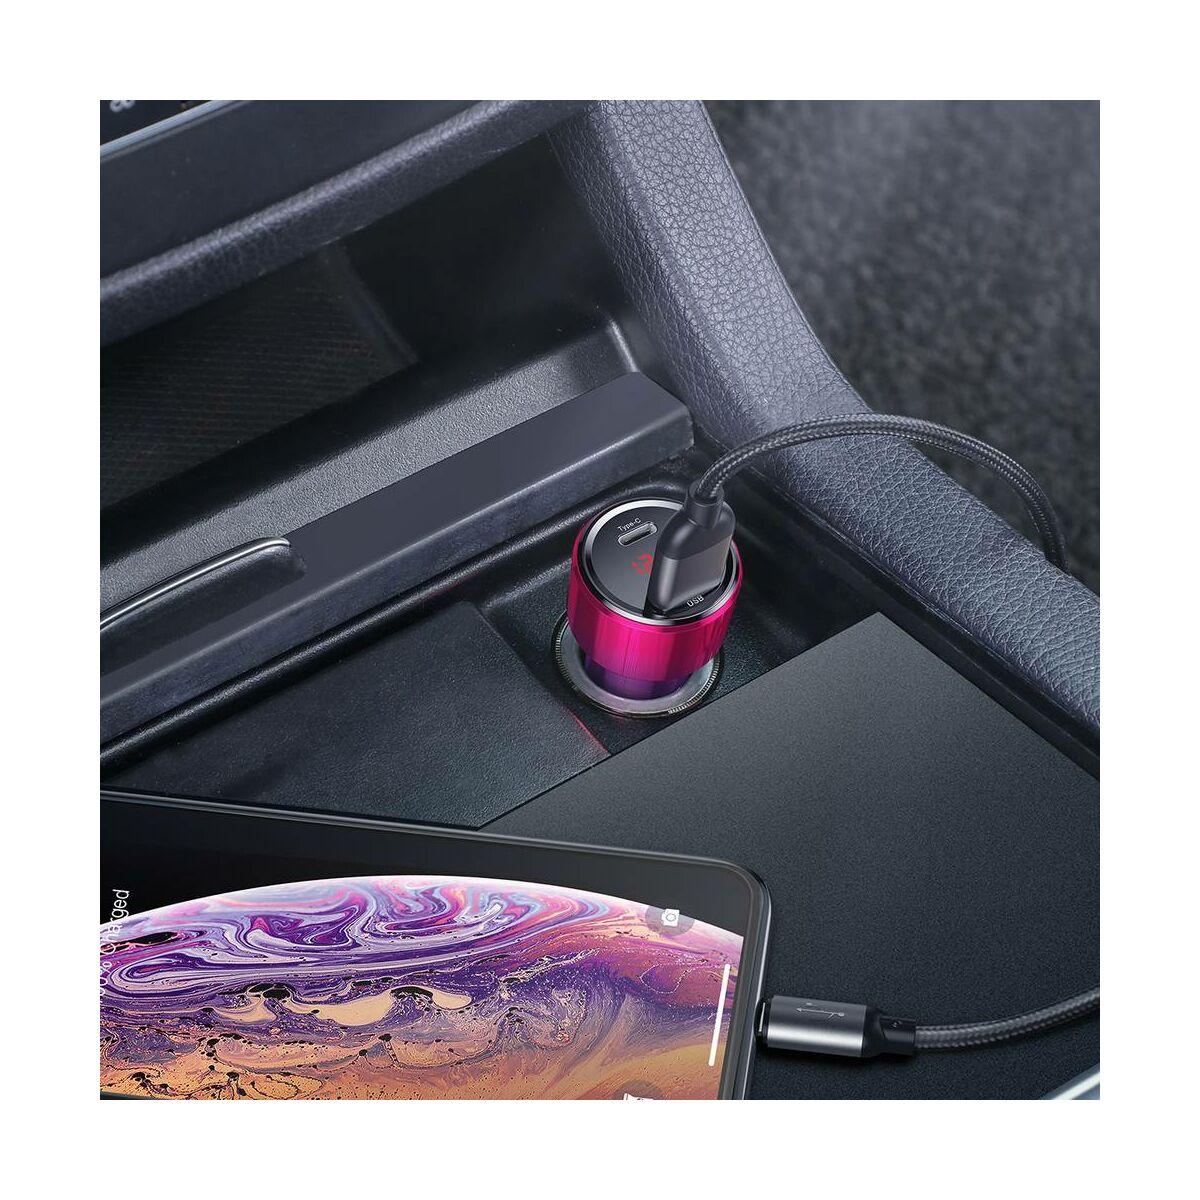 Baseus autós töltő, Magic Series PPS digitális kijelzővel (Type-C PD+Dual QC) 45W, piros (CCMLC20C-09)